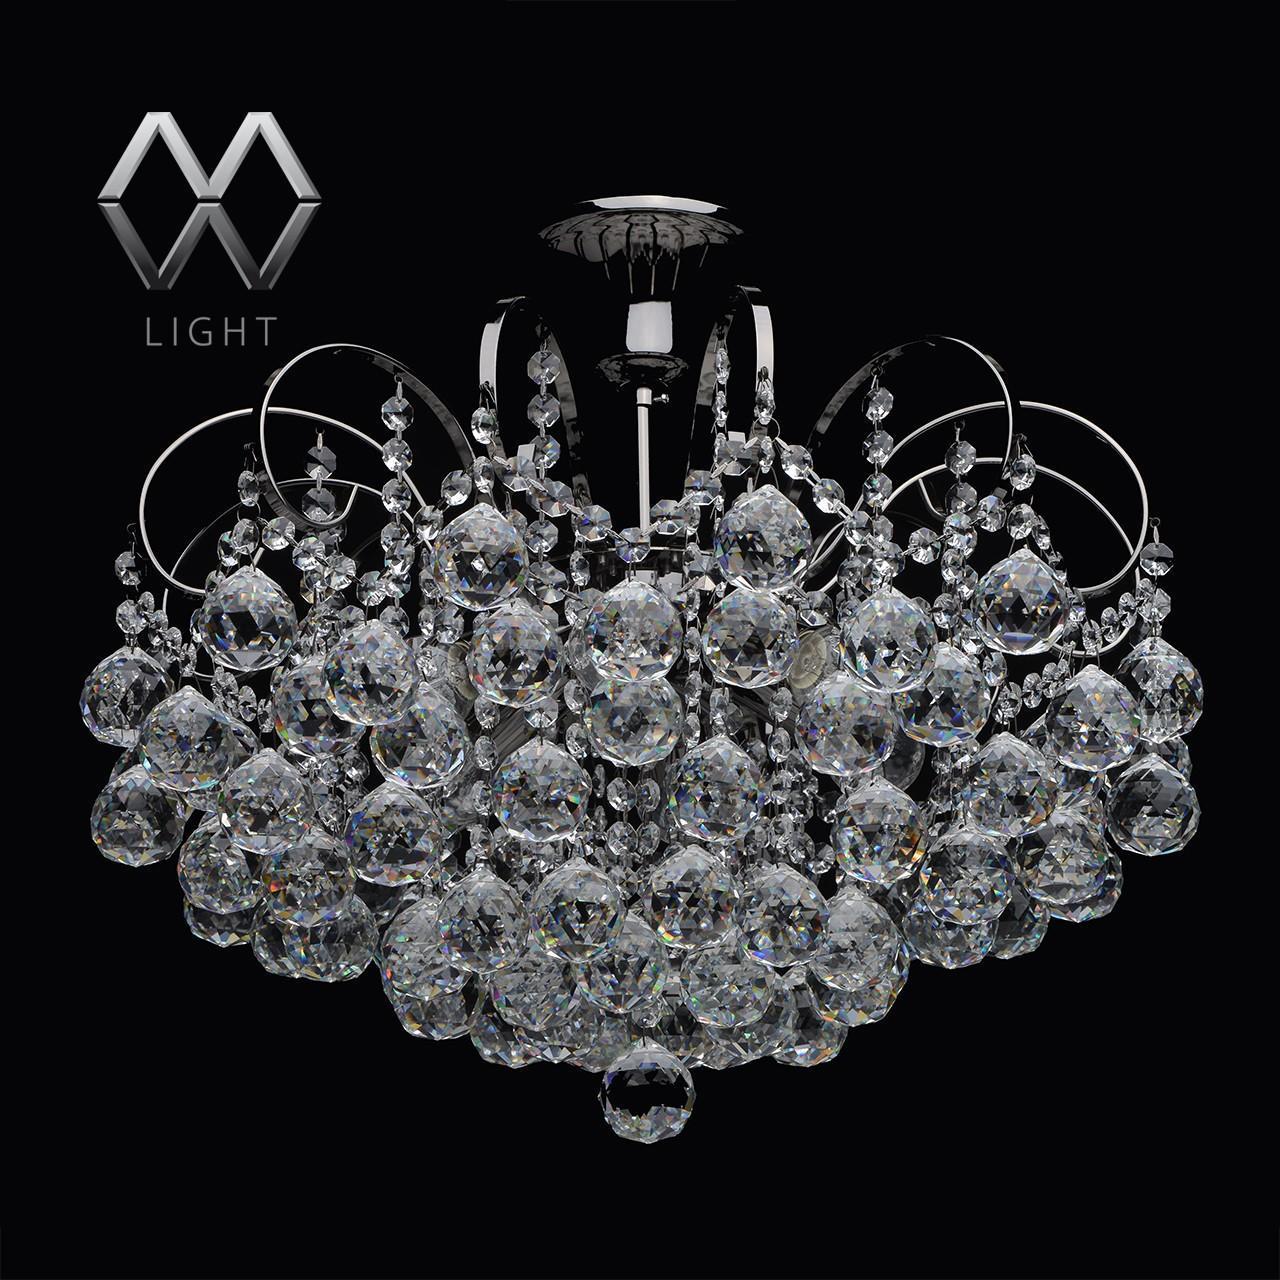 Люстра MW-Light Жемчуг 8 232016306 потолочная потолочная люстра mw light жемчуг 232017106